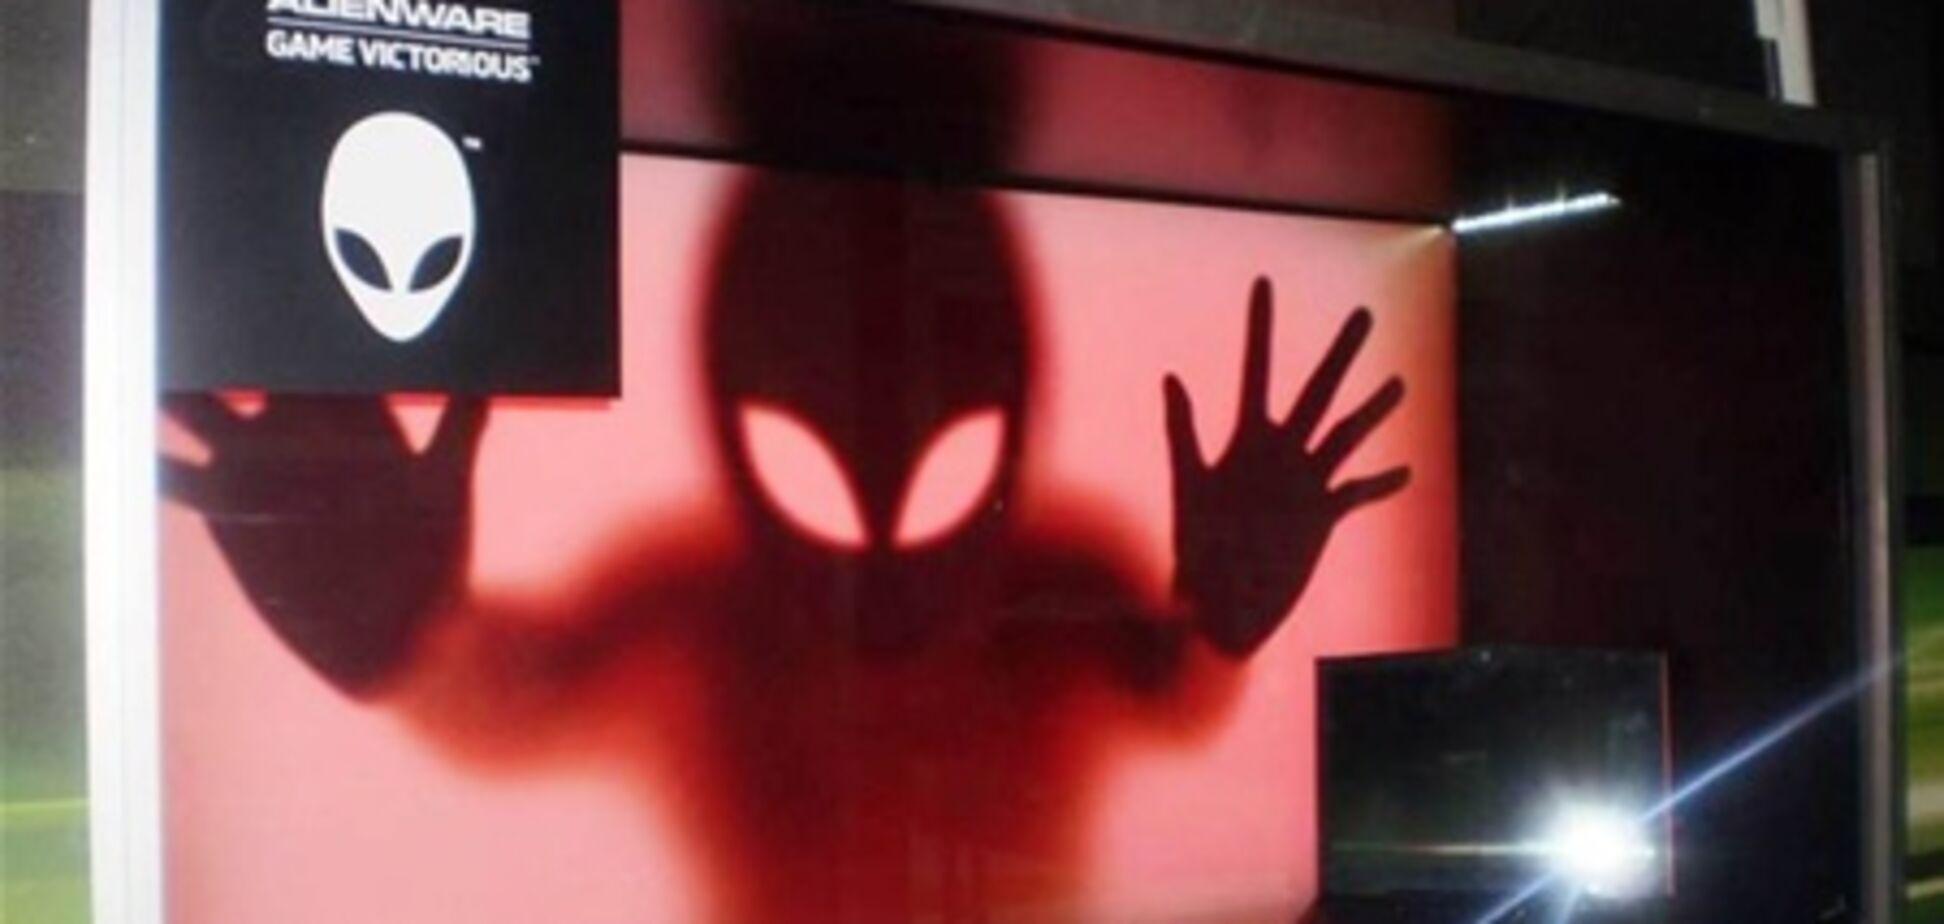 Dell презентует геймерскую зону Alienware в Украине. Фото